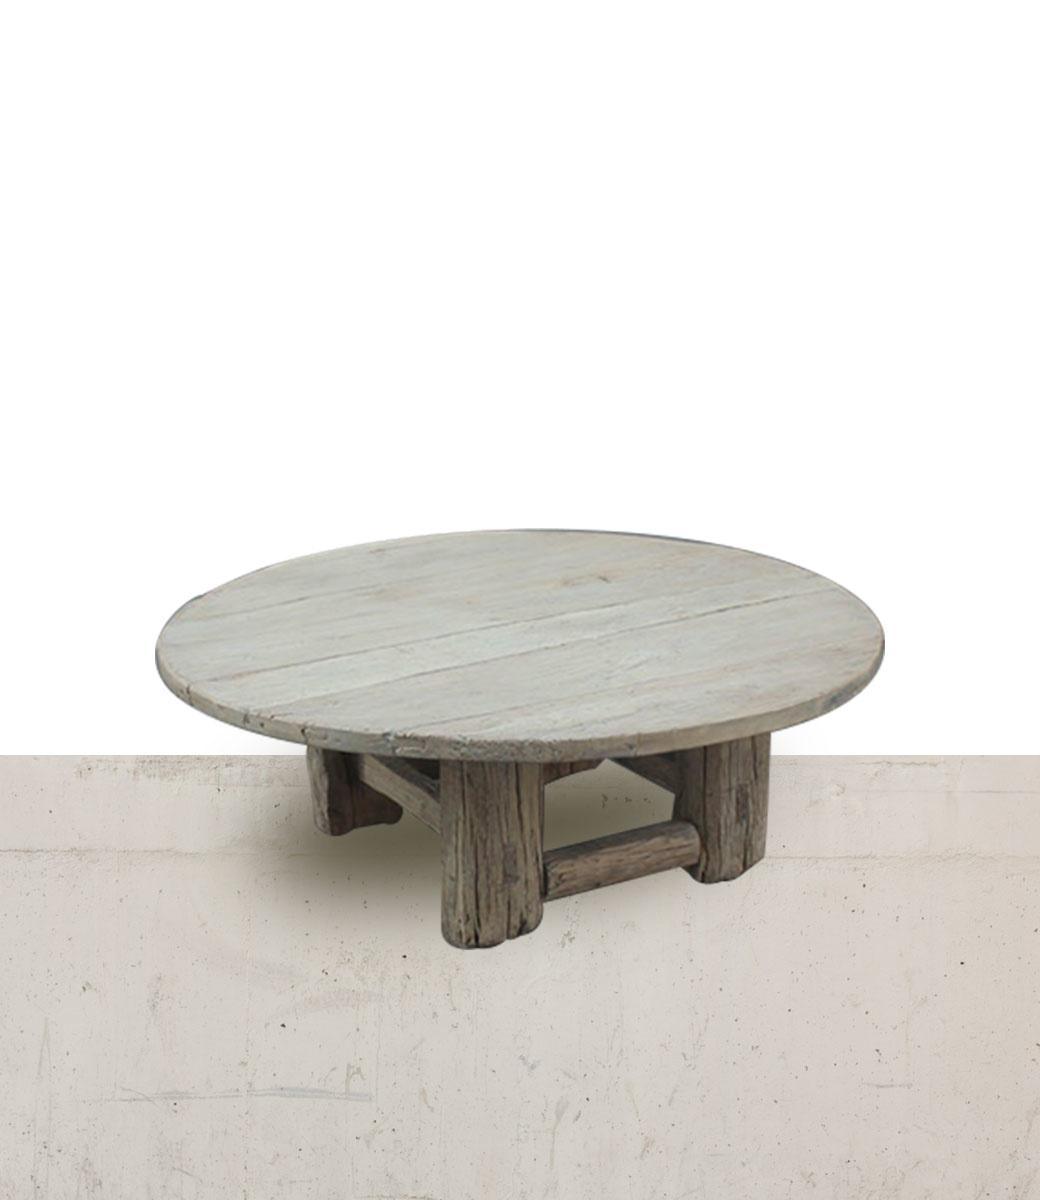 Petite Lily Interiors Table basse naturelle - rond - 130xh46cm - Bois d'orme